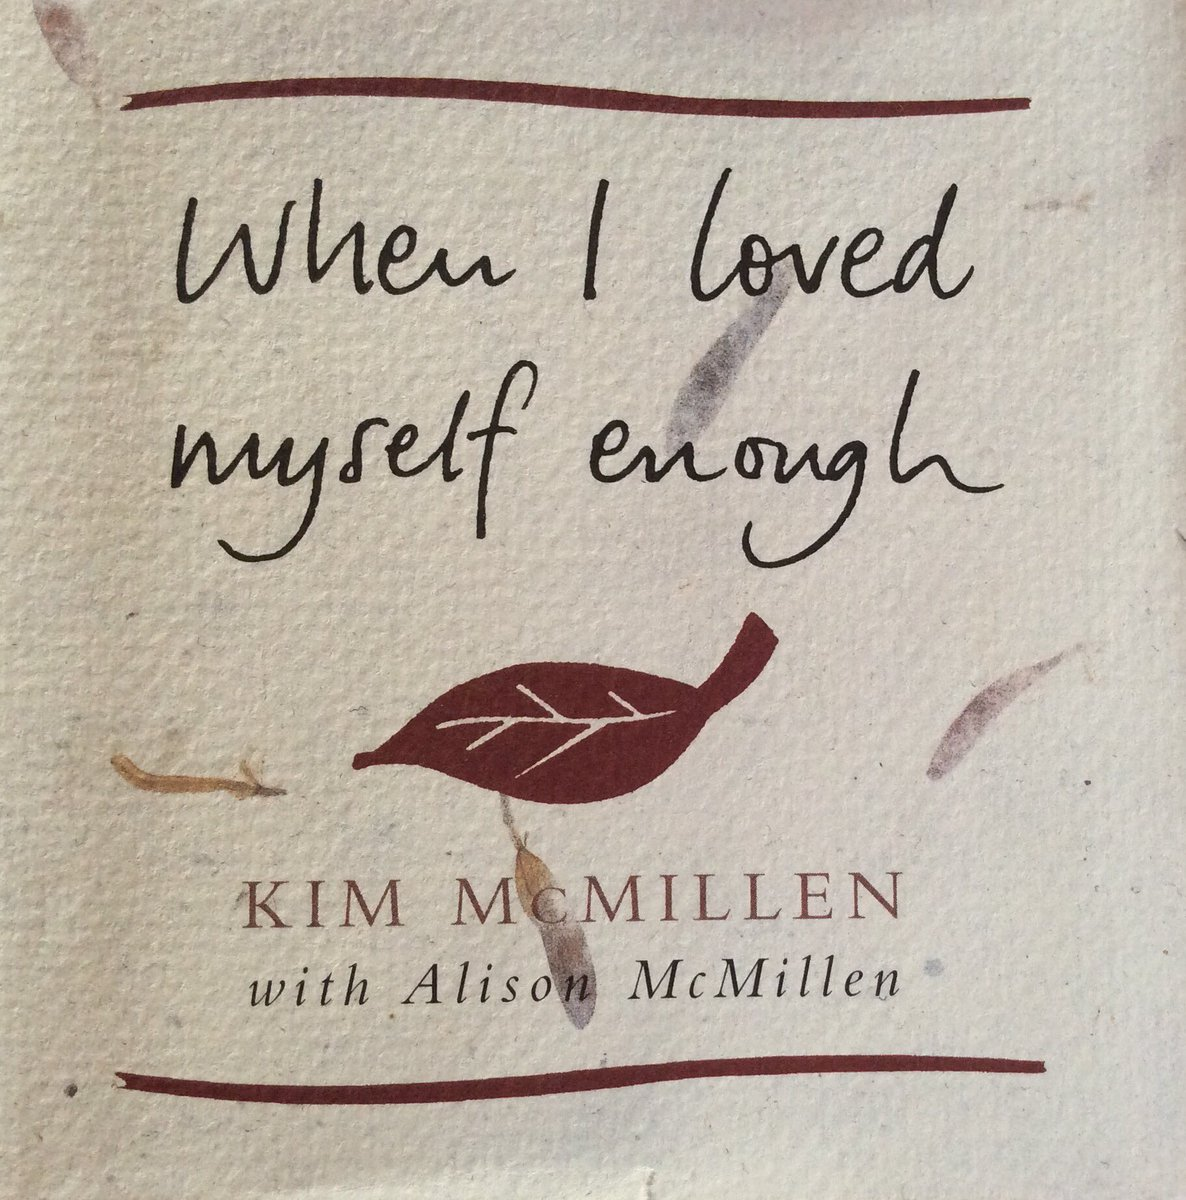 Kim McMillen